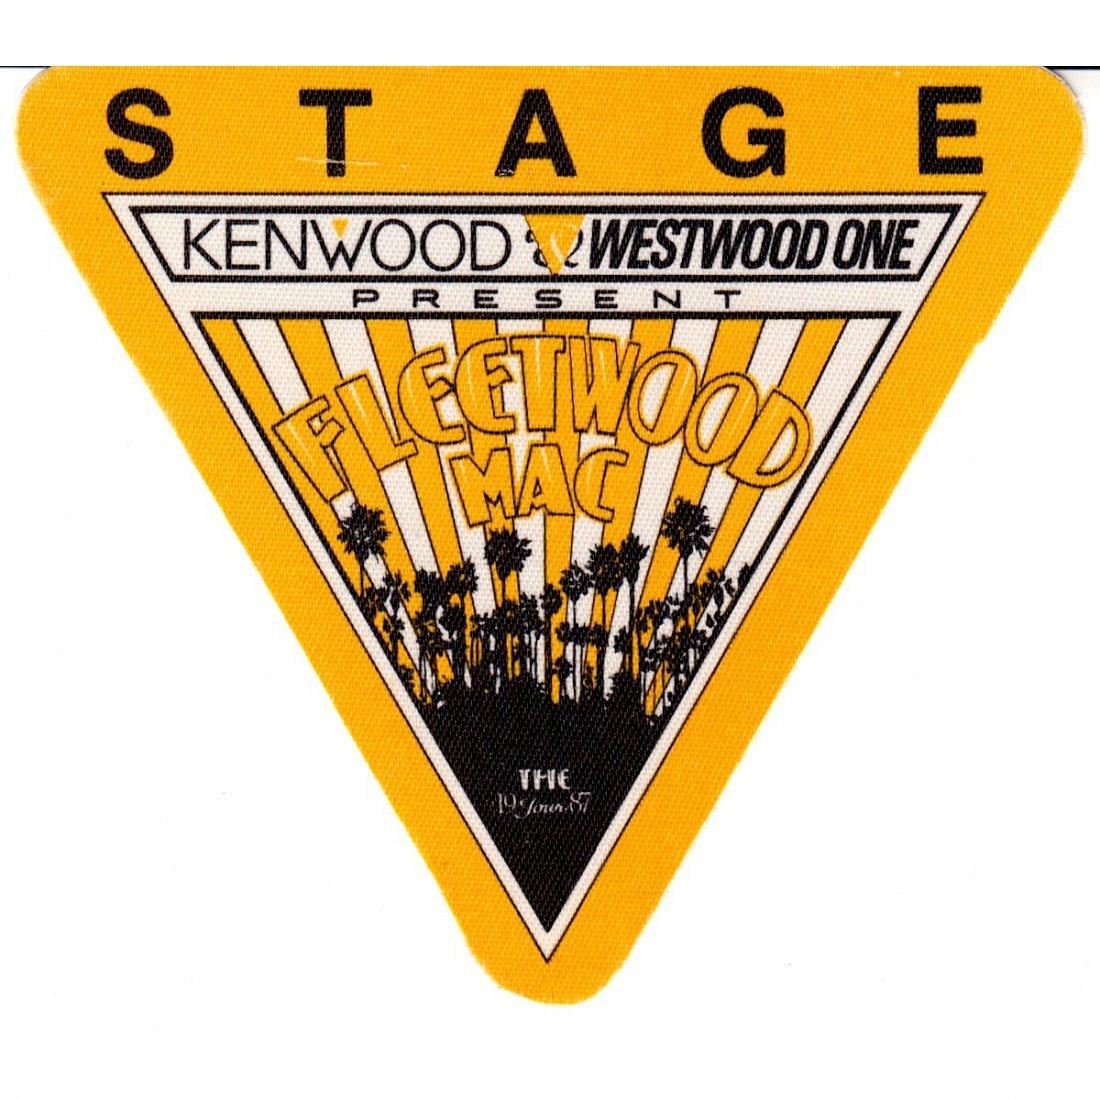 Fleetwood Mac - 1987 Backstage Pass